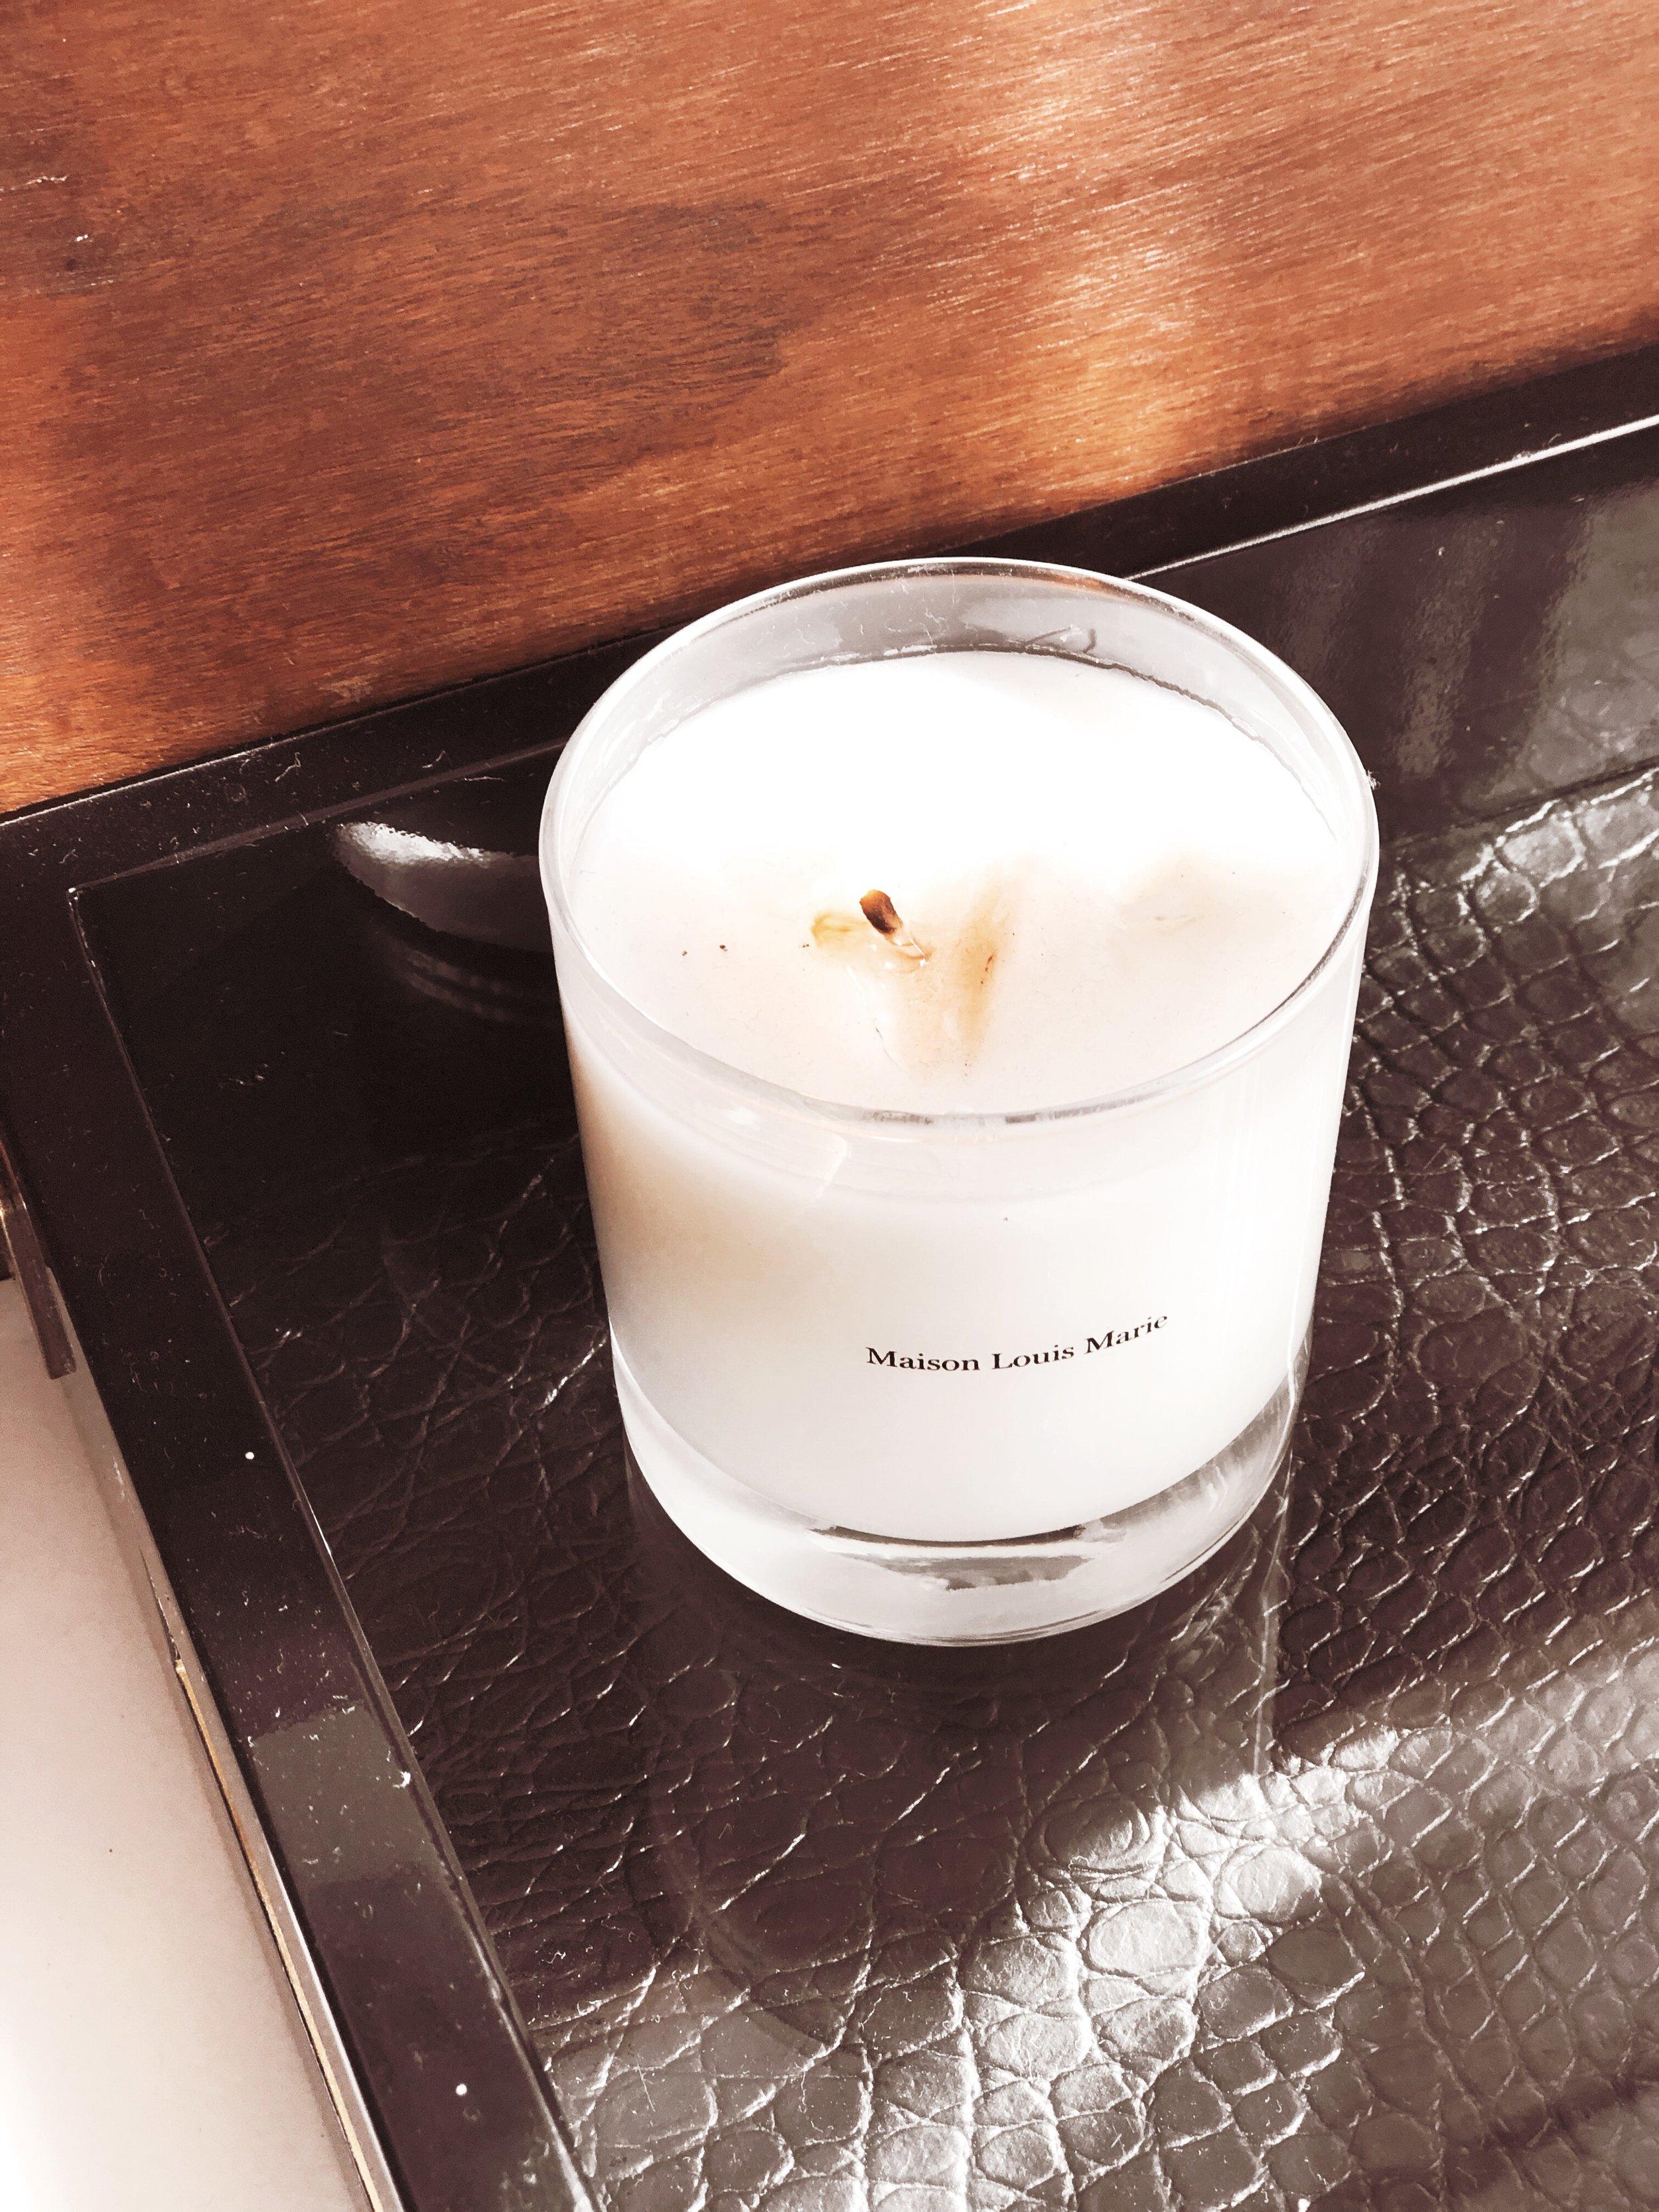 july 2019 lolla winter candles velas favoritas inverno maison louis marie lollaJPG?format=original - Winter Candles: Minhas velas favoritas para o inverno